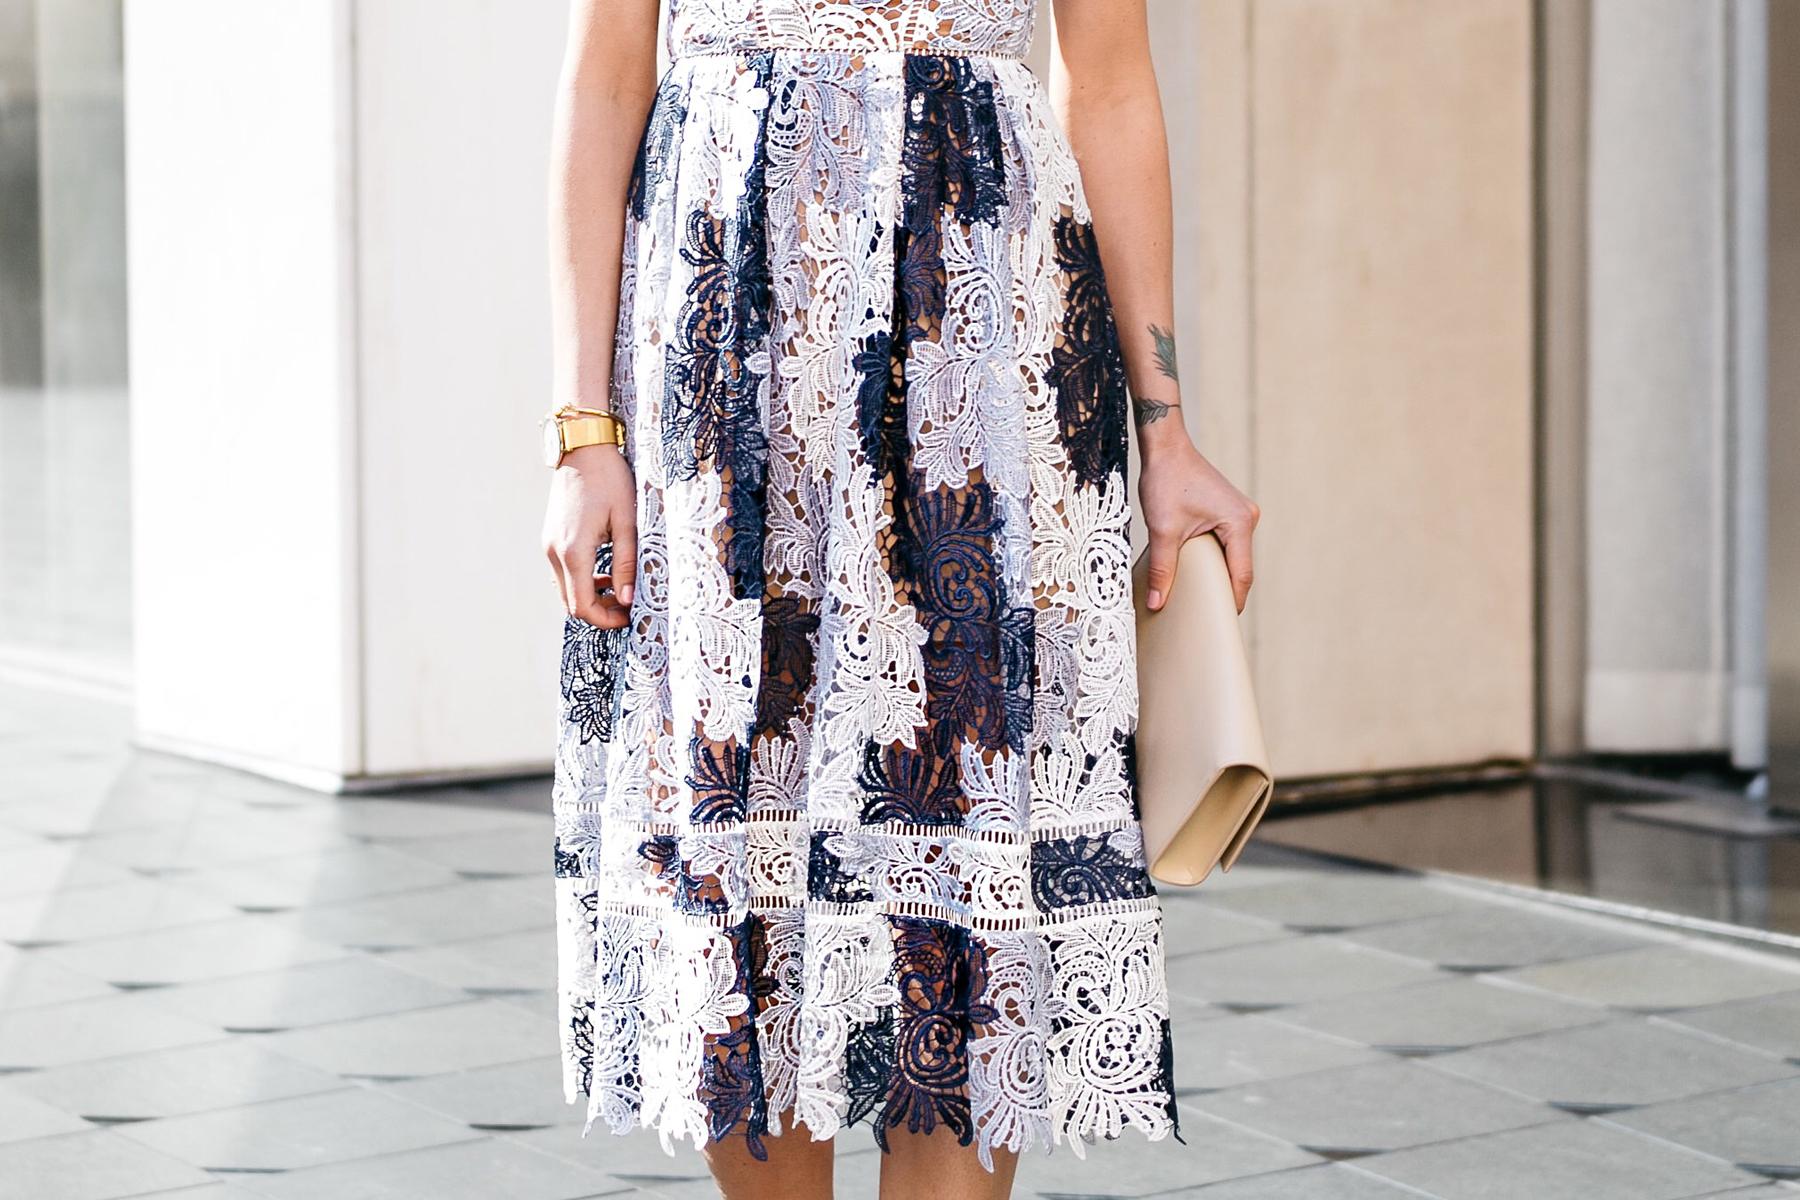 Fashion Jackson, Dallas Blogger, Fashion Blogger, Street Style, Self-Portrait Camellias Lace Dress